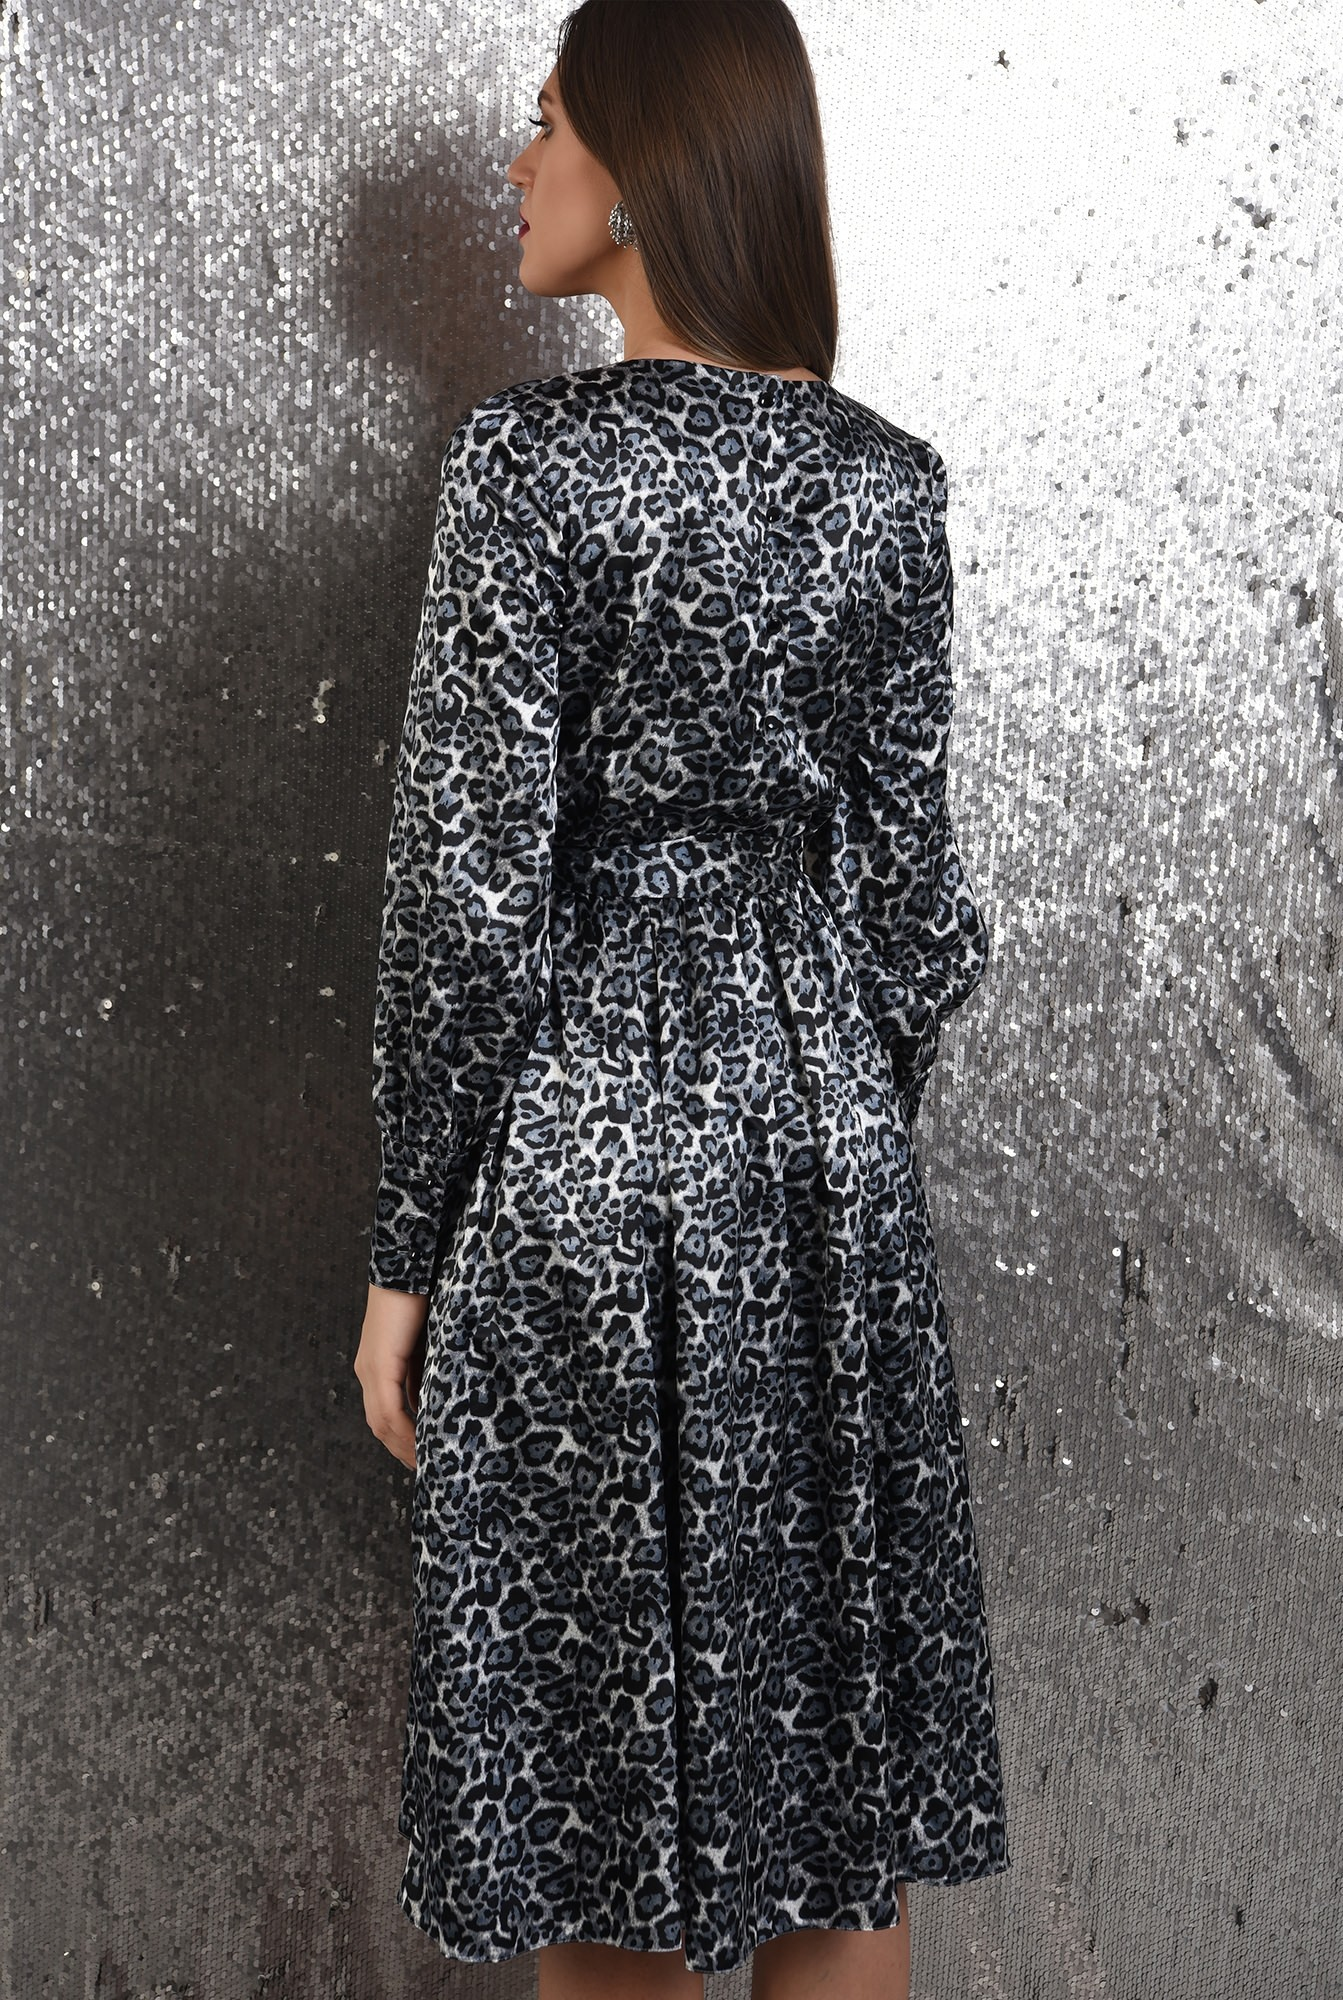 1 - rochie eleganta, din satin, animal print, nasturi la spate, evazata